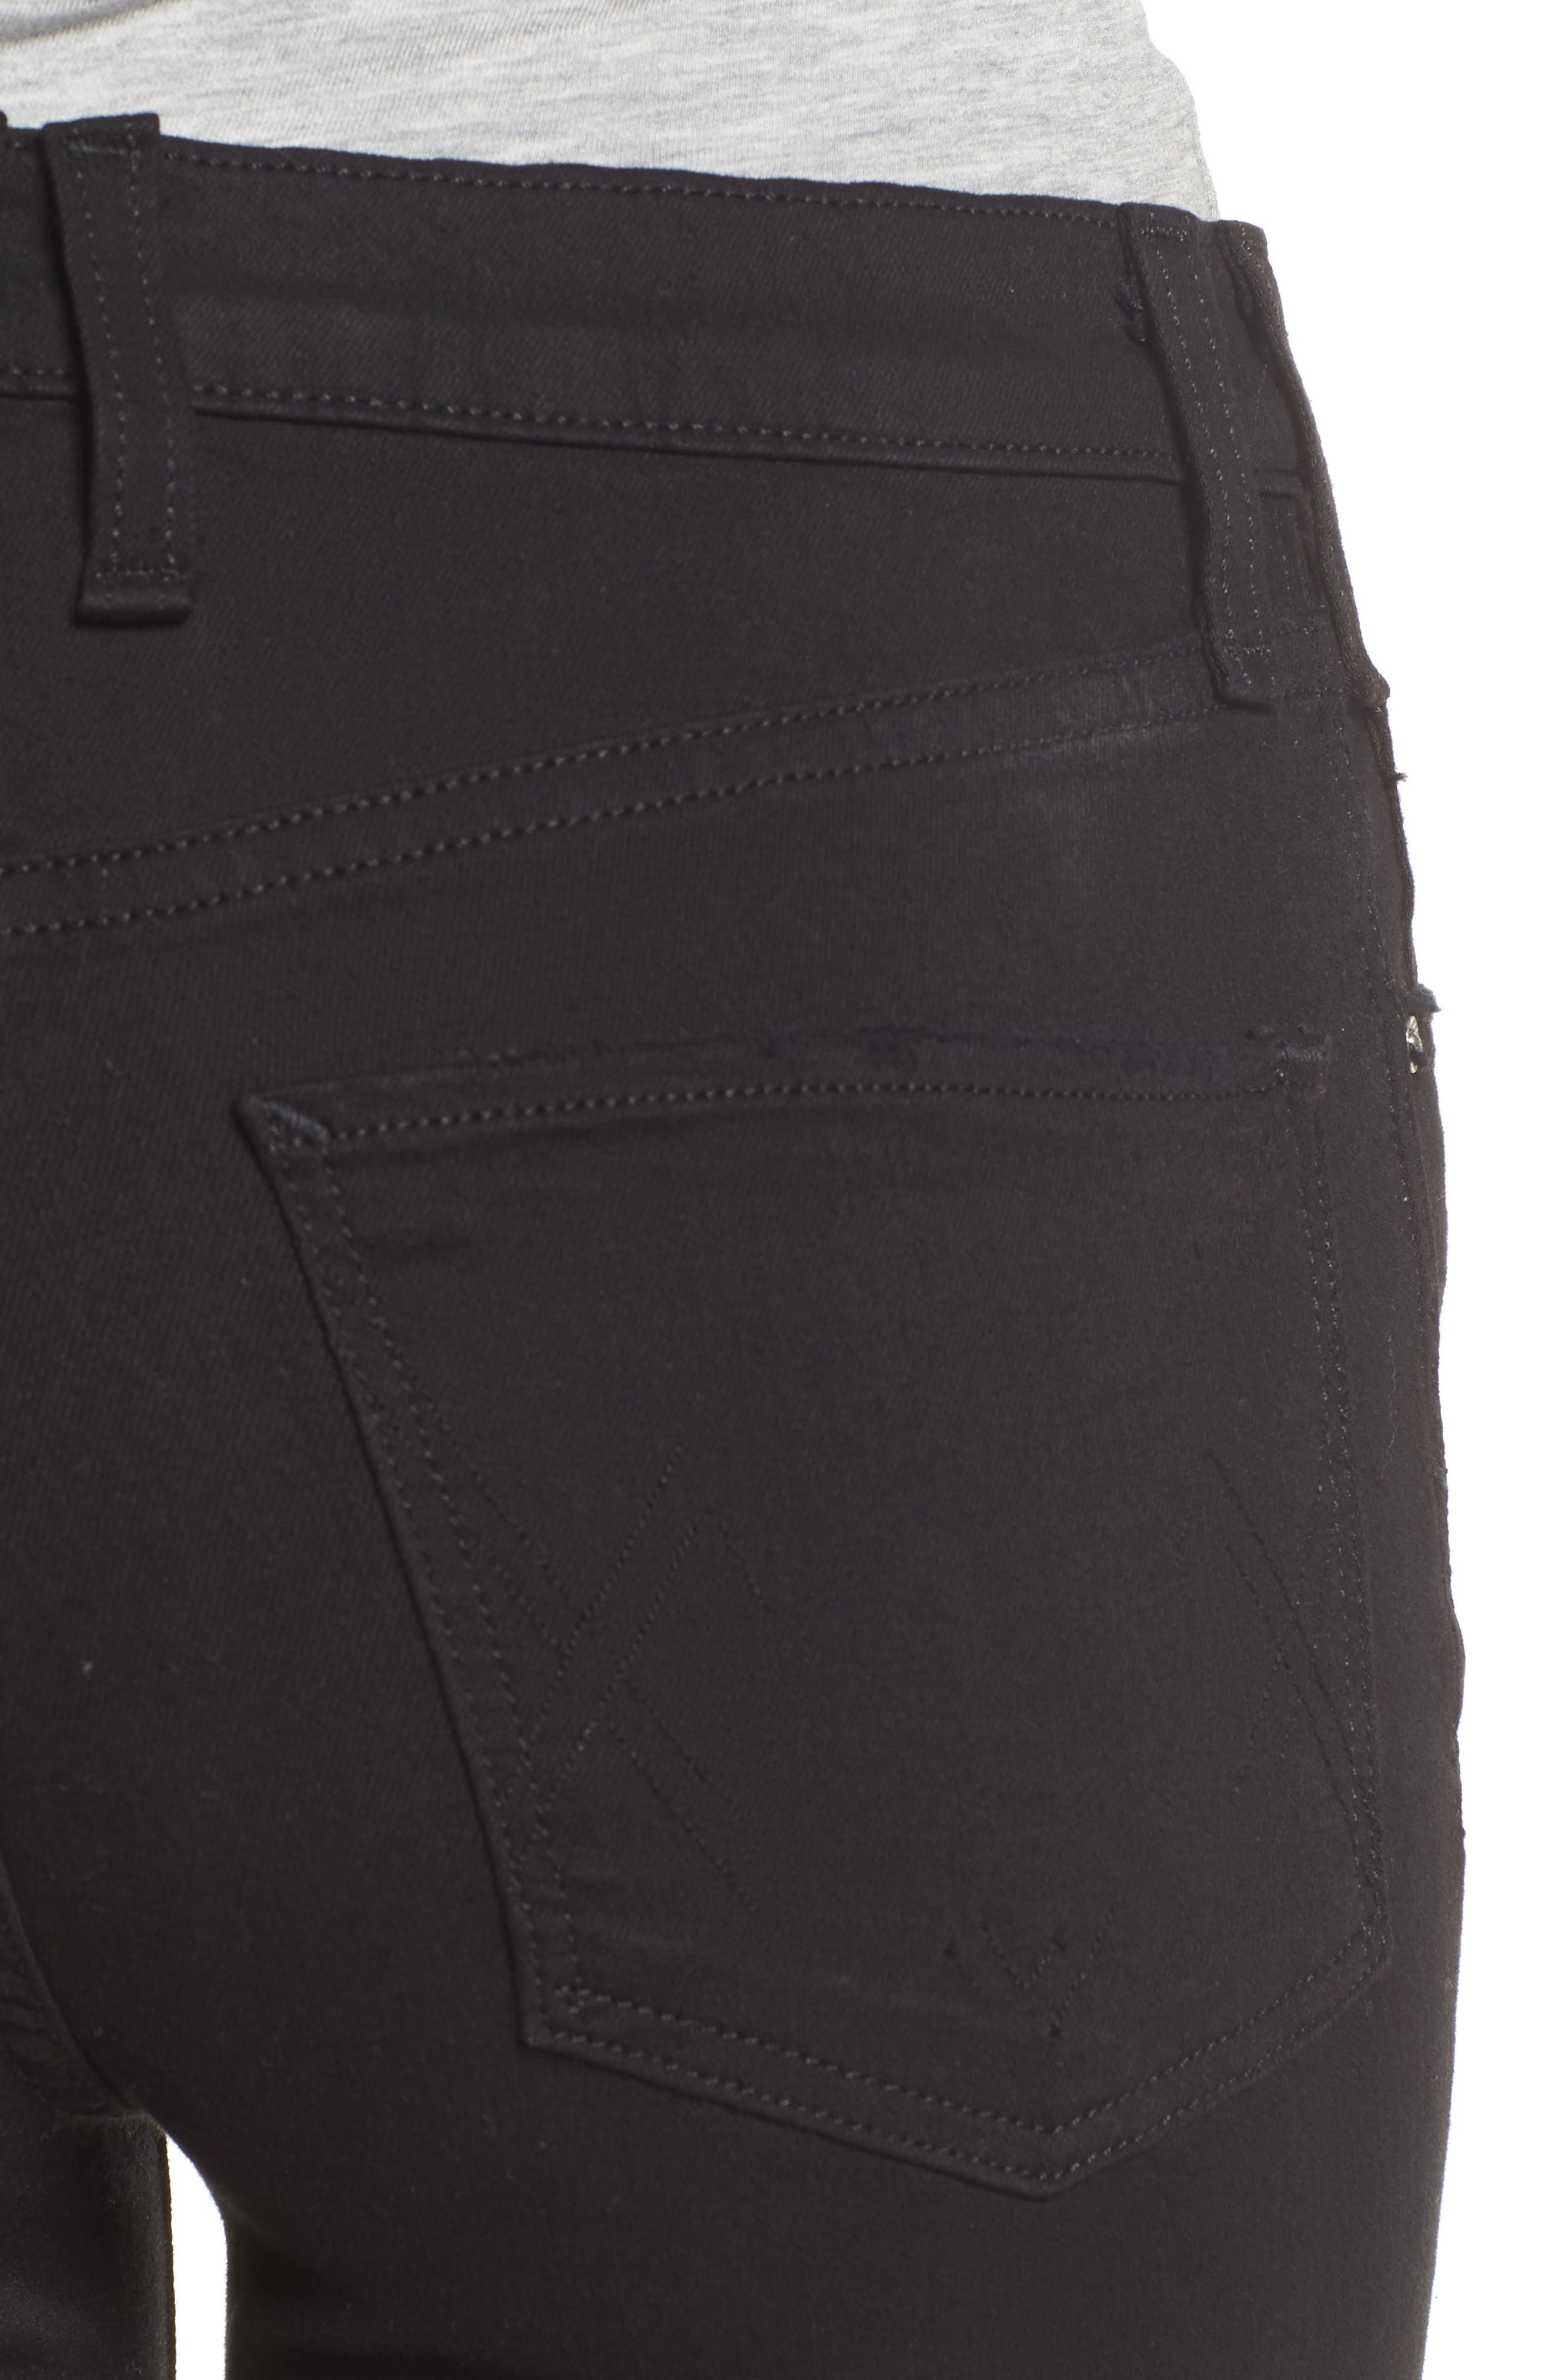 Newton High Waist Ankle Skinny Jeans,                             Alternate thumbnail 4, color,                             Reposado